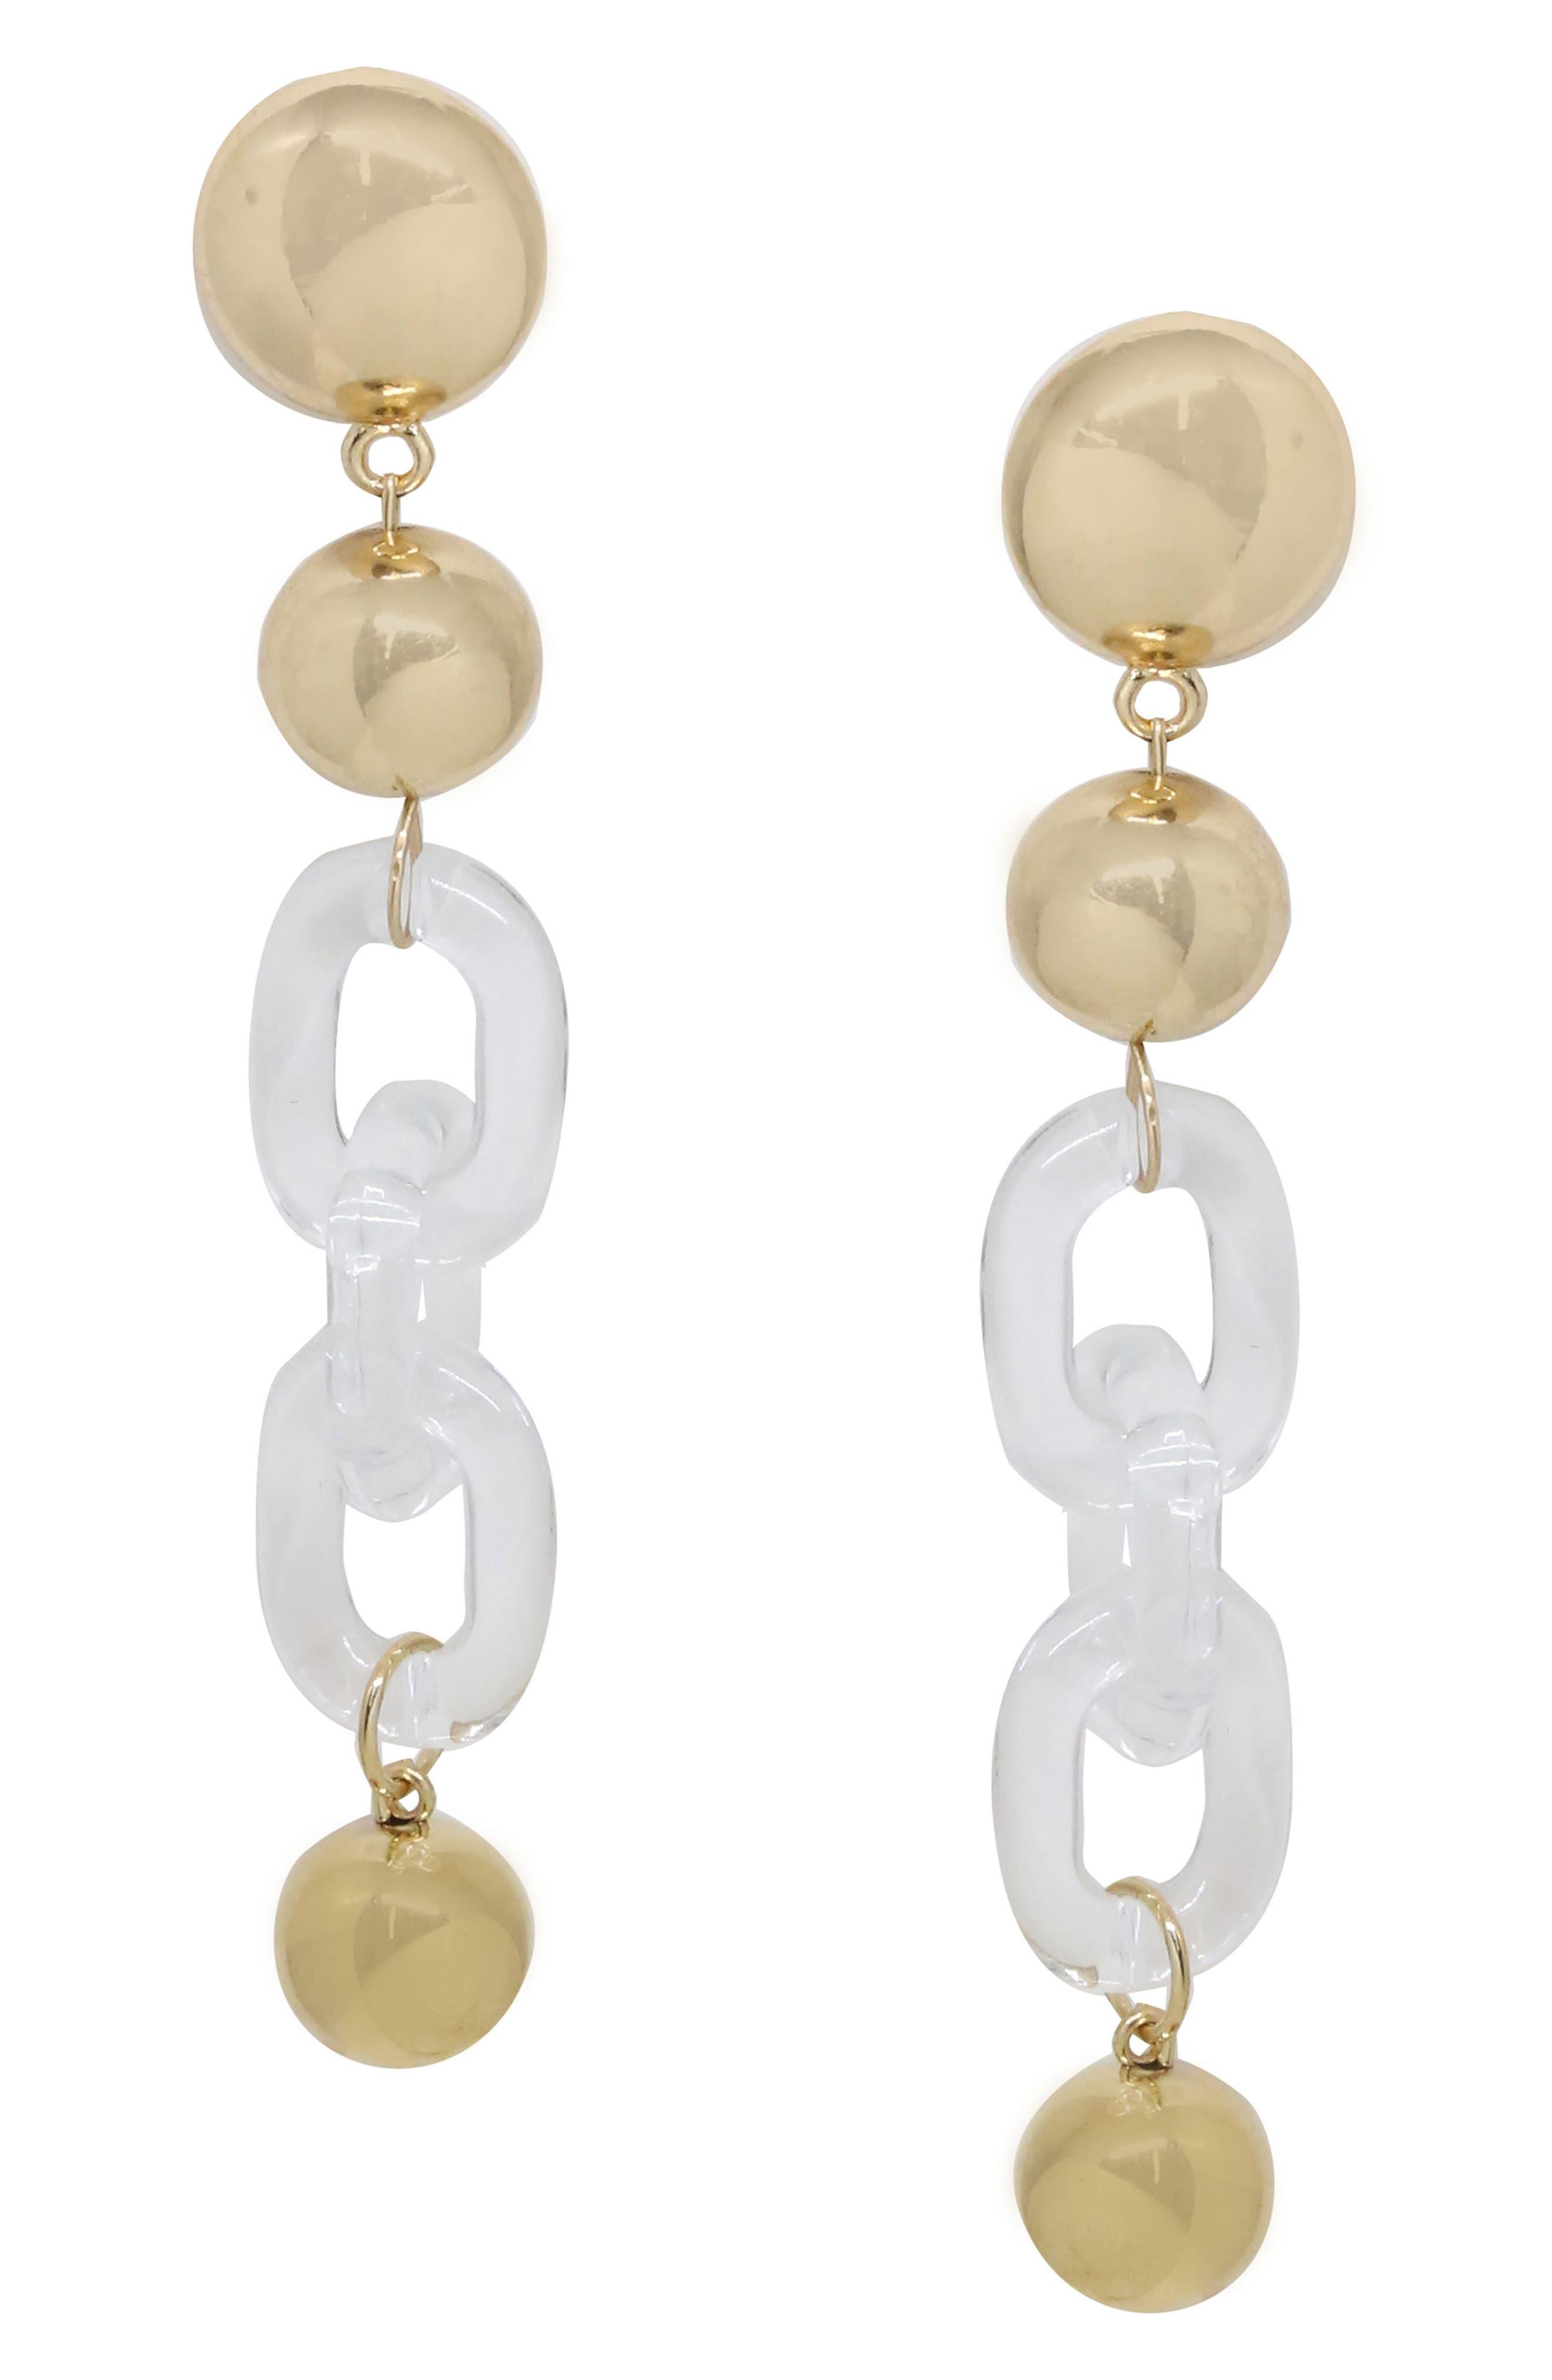 Chain & Sphere Drop Earrings,                             Main thumbnail 1, color,                             710